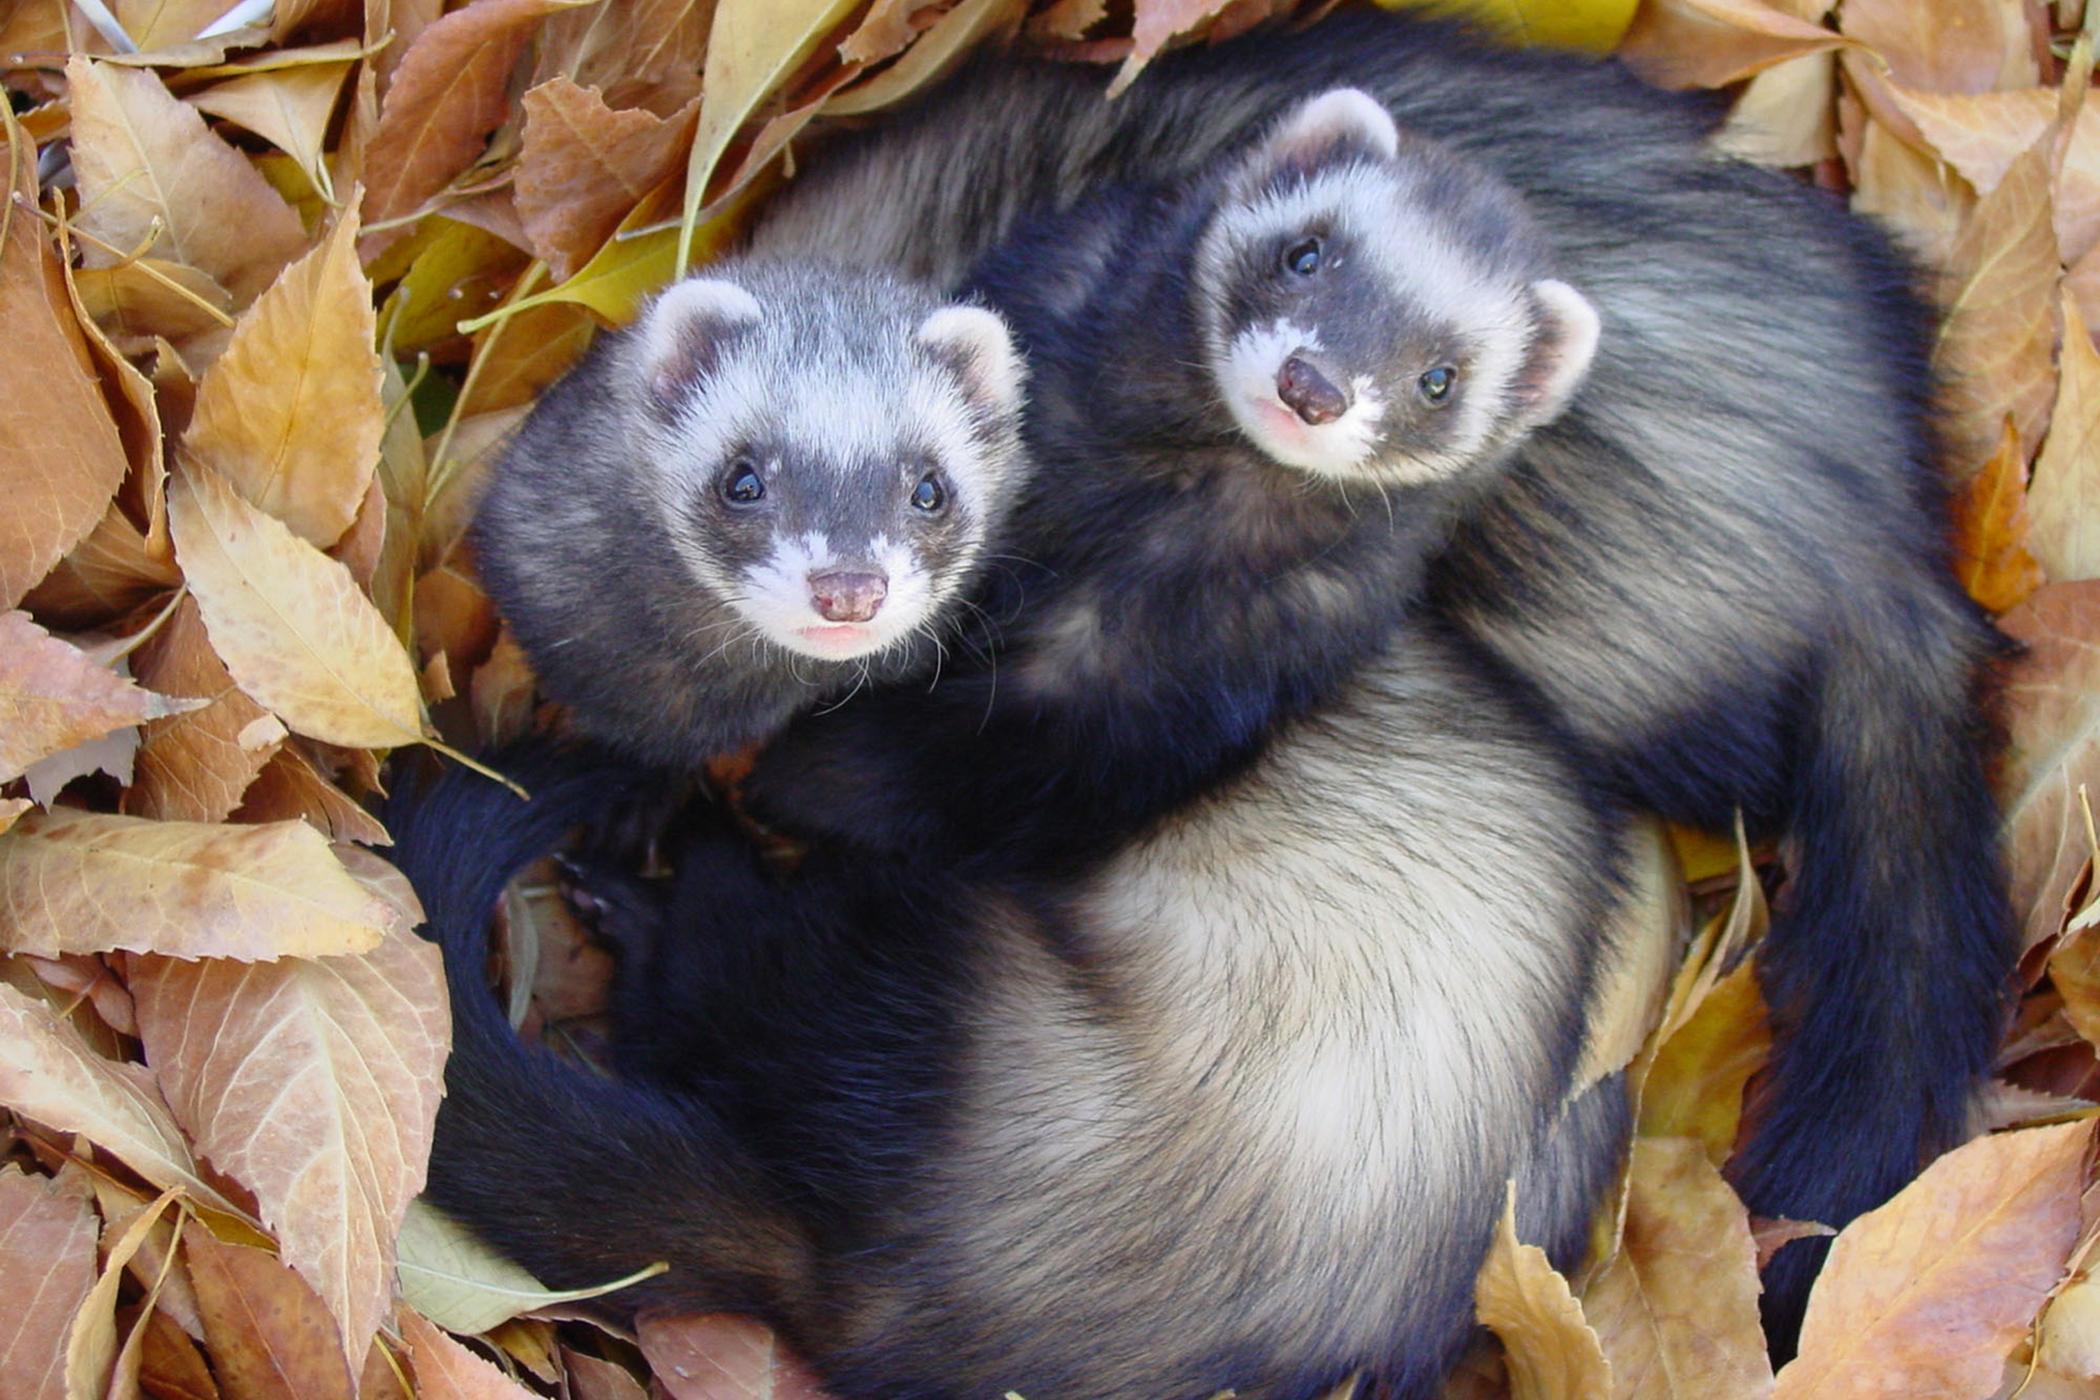 Salmonella Infection in Ferrets